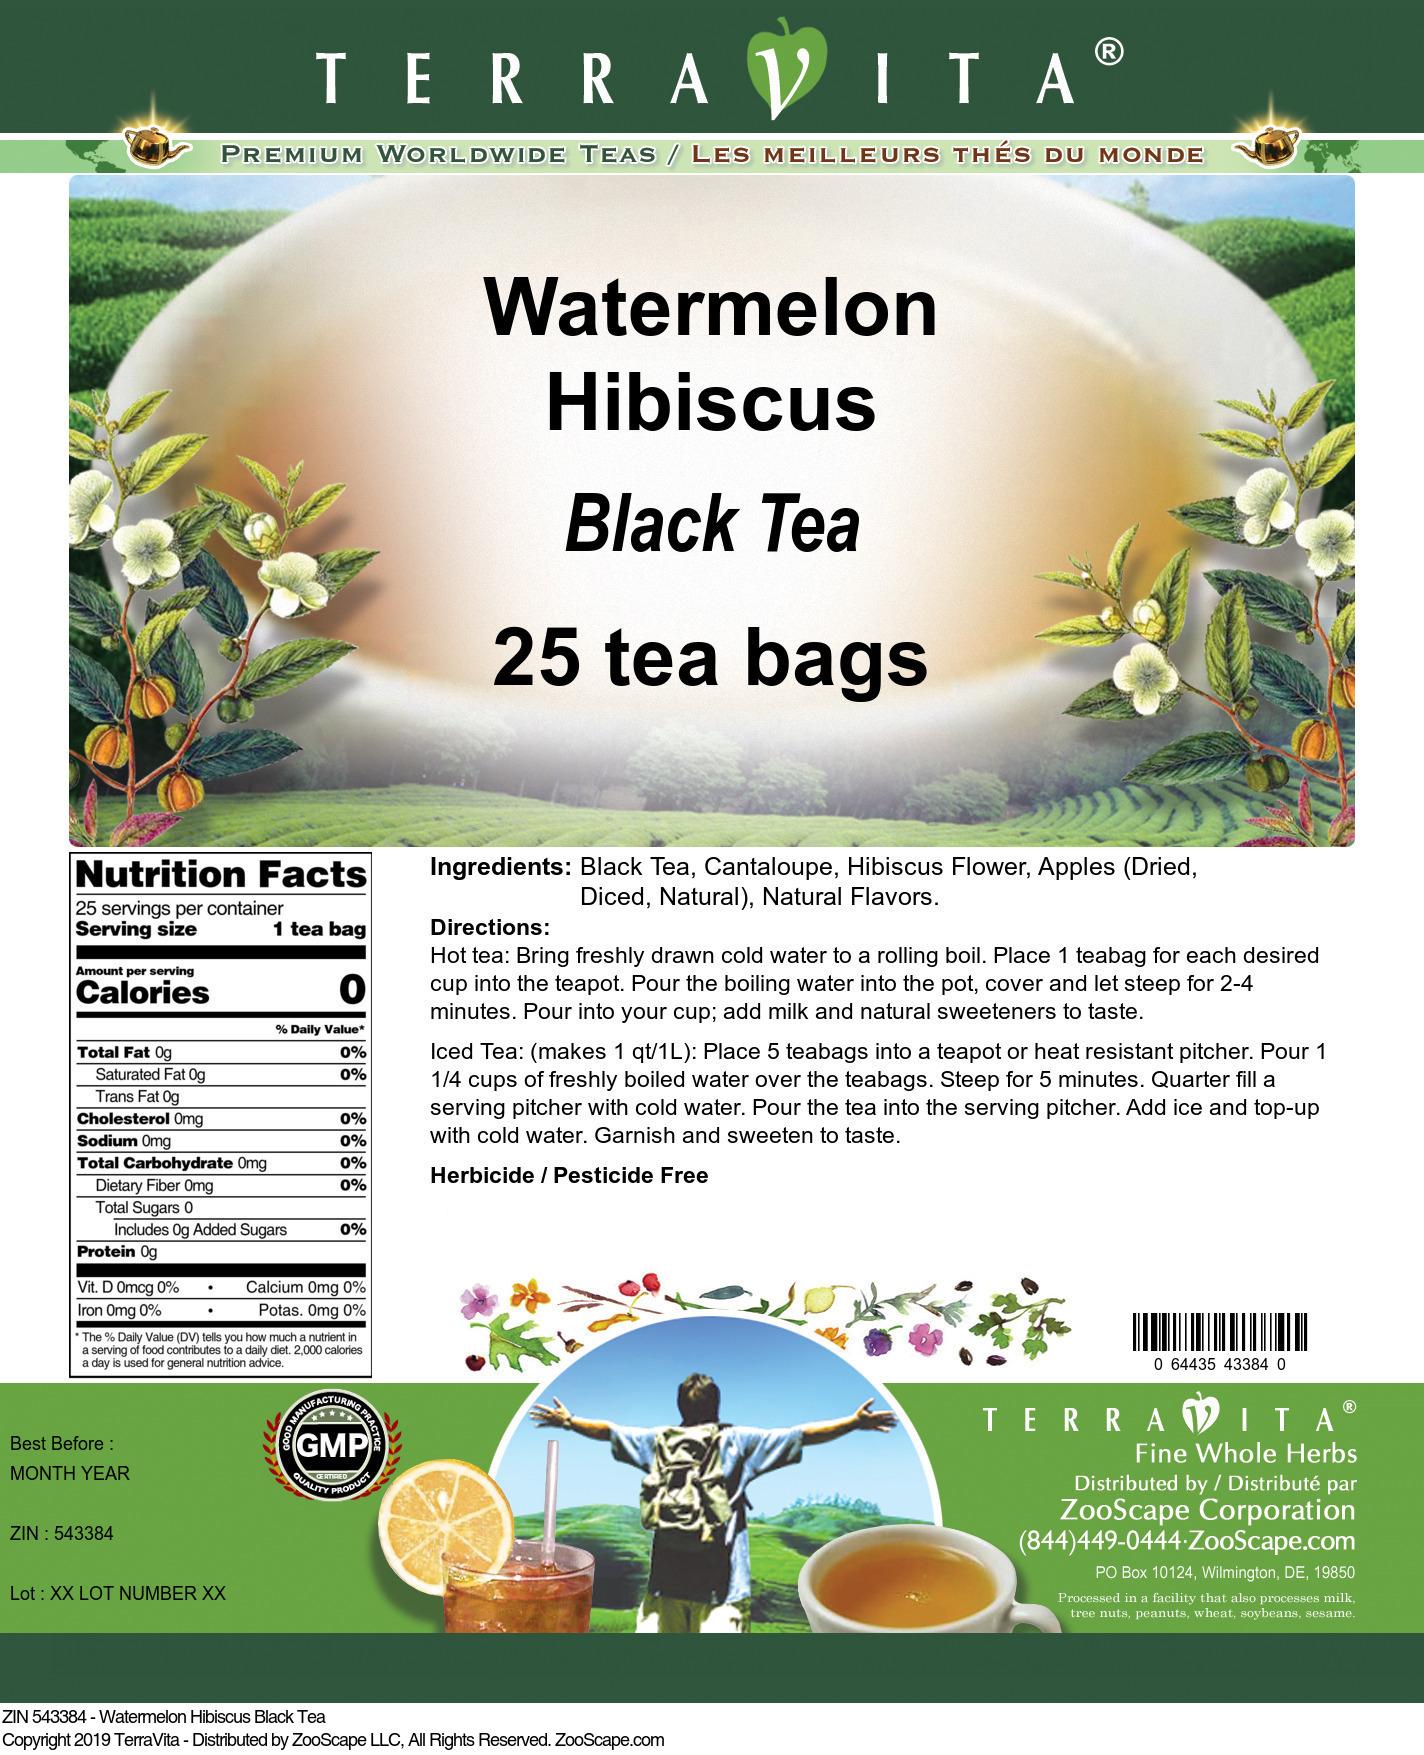 Watermelon Hibiscus Black Tea